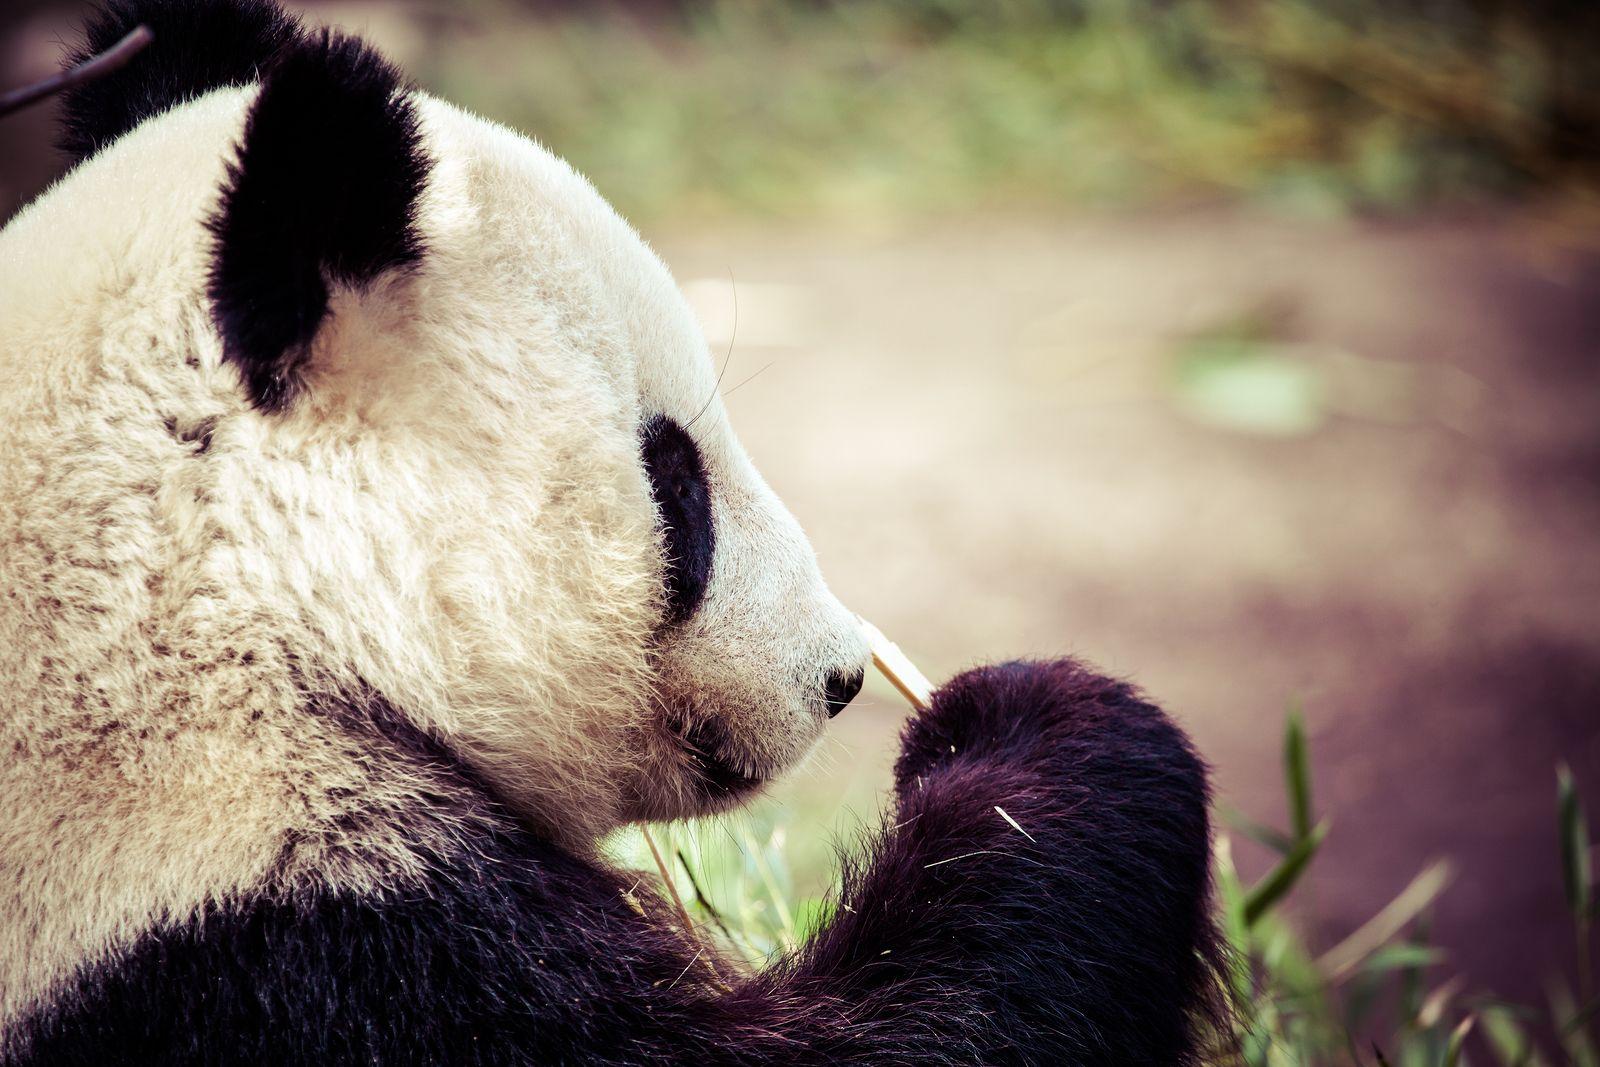 iMOB Google's Panda 4.1 Rollout Still in Progress